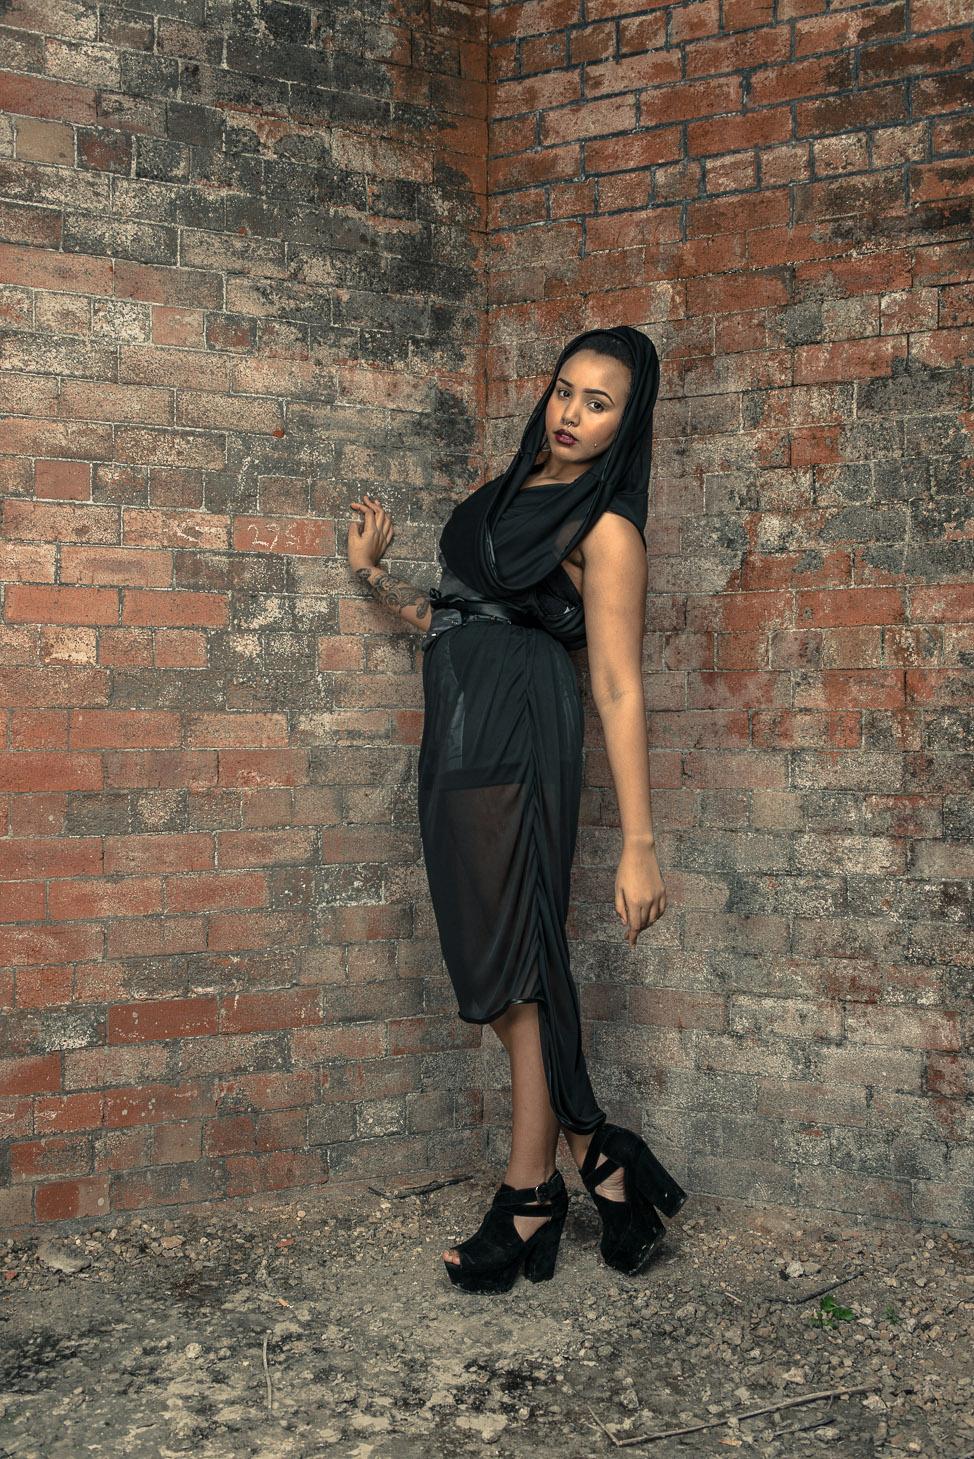 zaramia-ava-zaramiaava-leeds-fashion-designer-ethical-sustainable-tailored-minimalist-sheer-versatile-drape-dress-black-hood-binding-belt-wrap-cowl-styling-bodysuit-womenswear-models-photoshoot-6